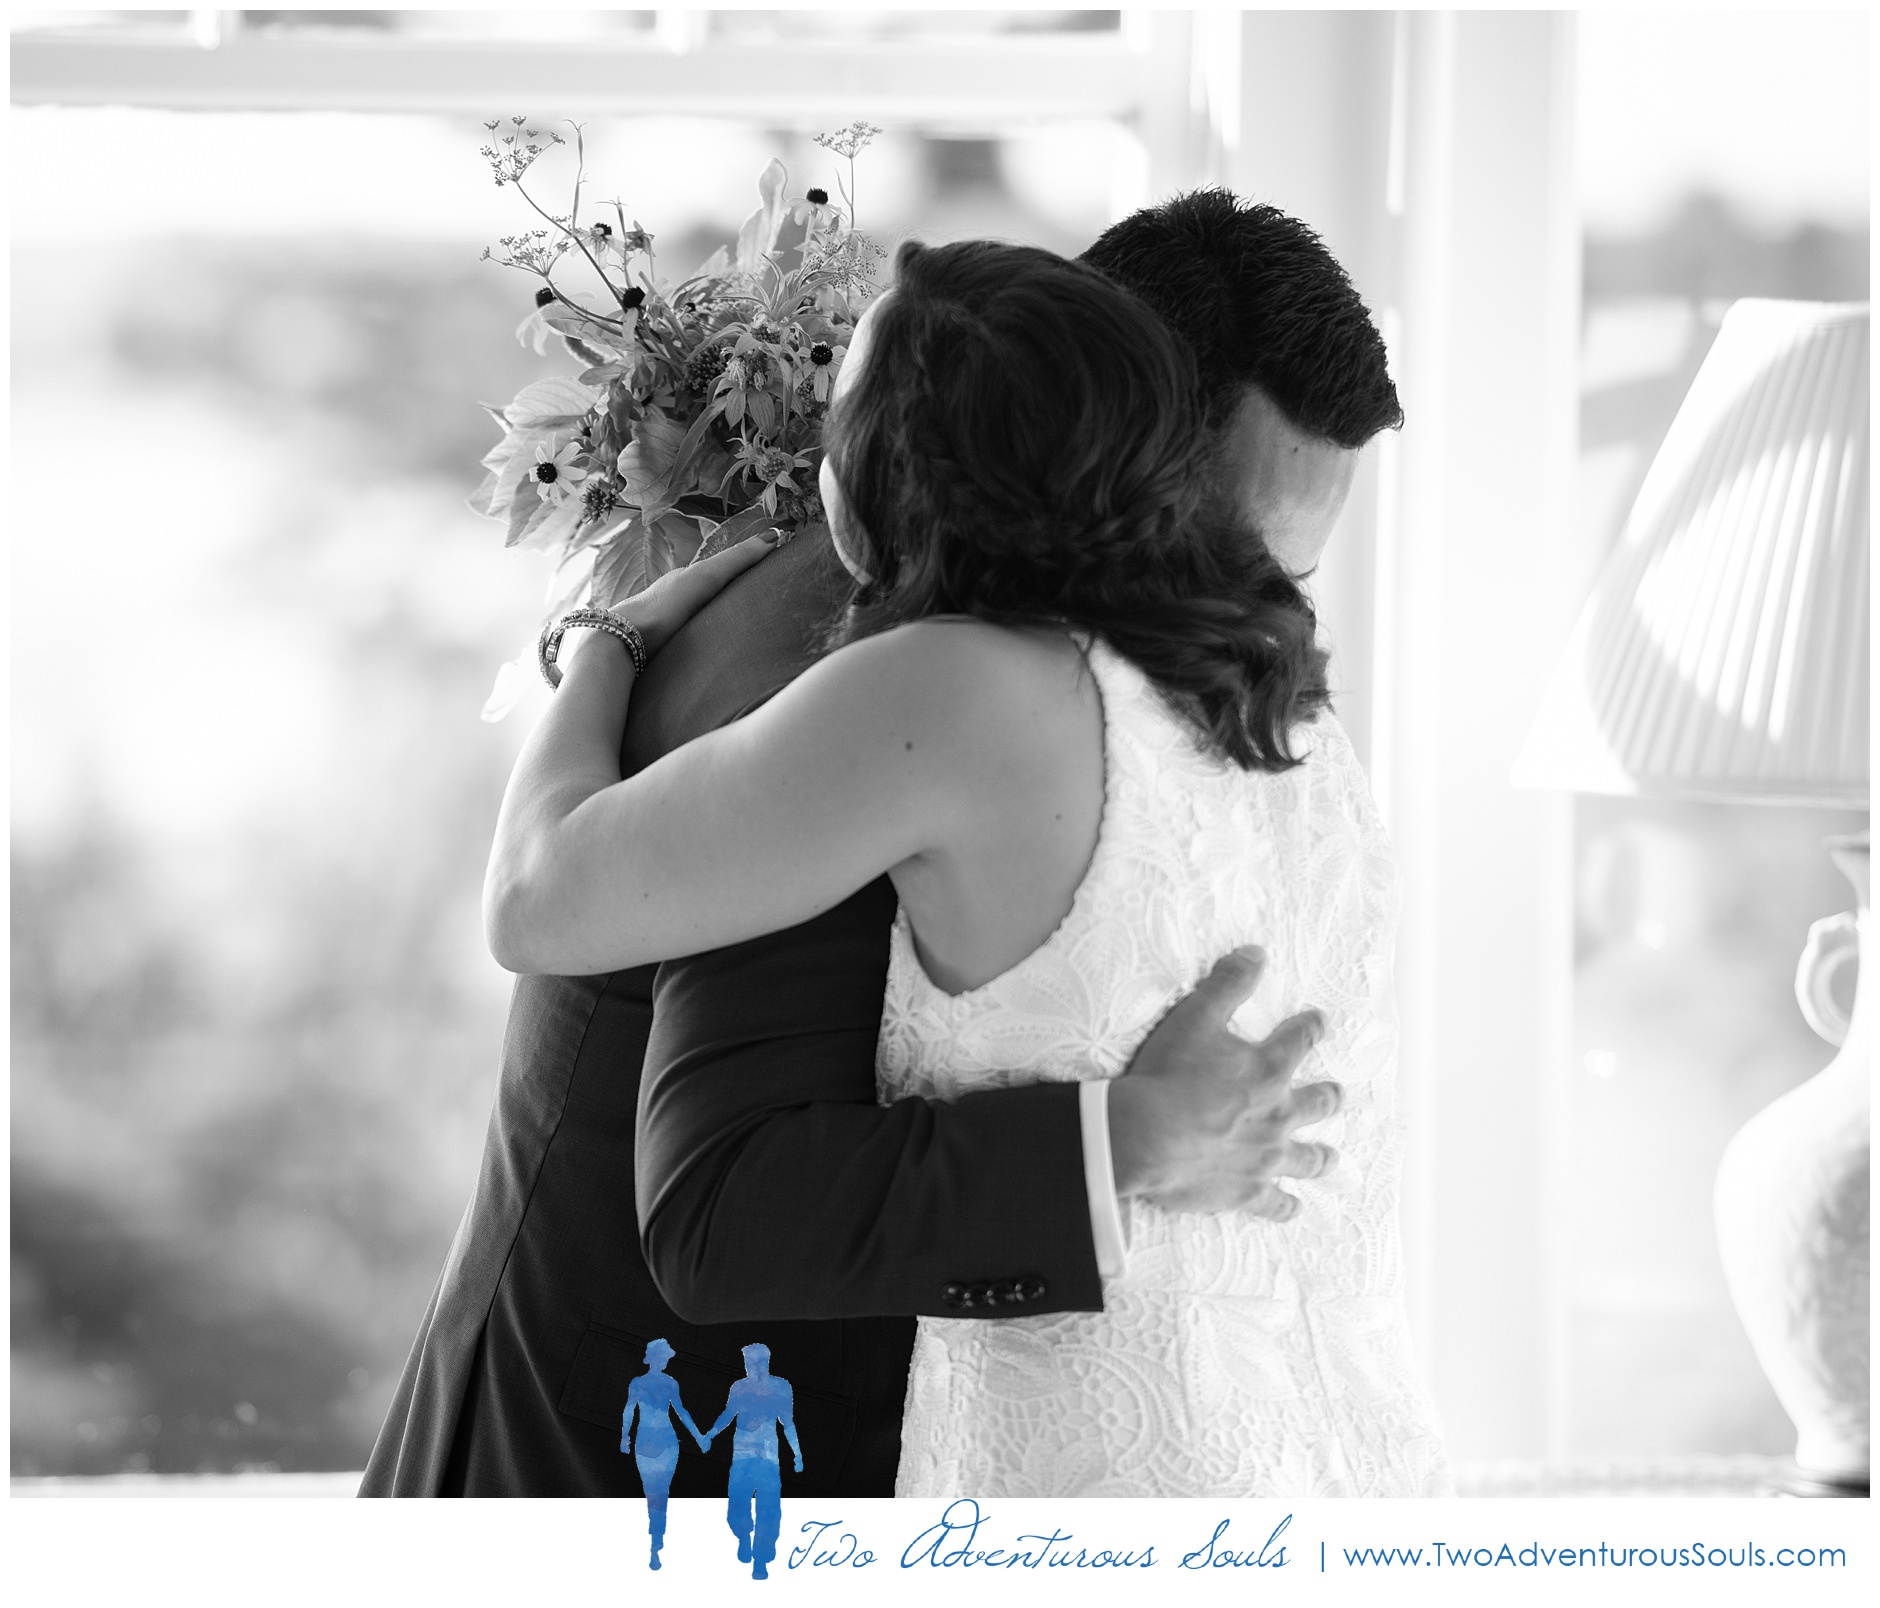 Black Point Inn Wedding Photographers, Scarborough Wedding Photographers, Two Adventurous Souls- 083019_0003.jpg